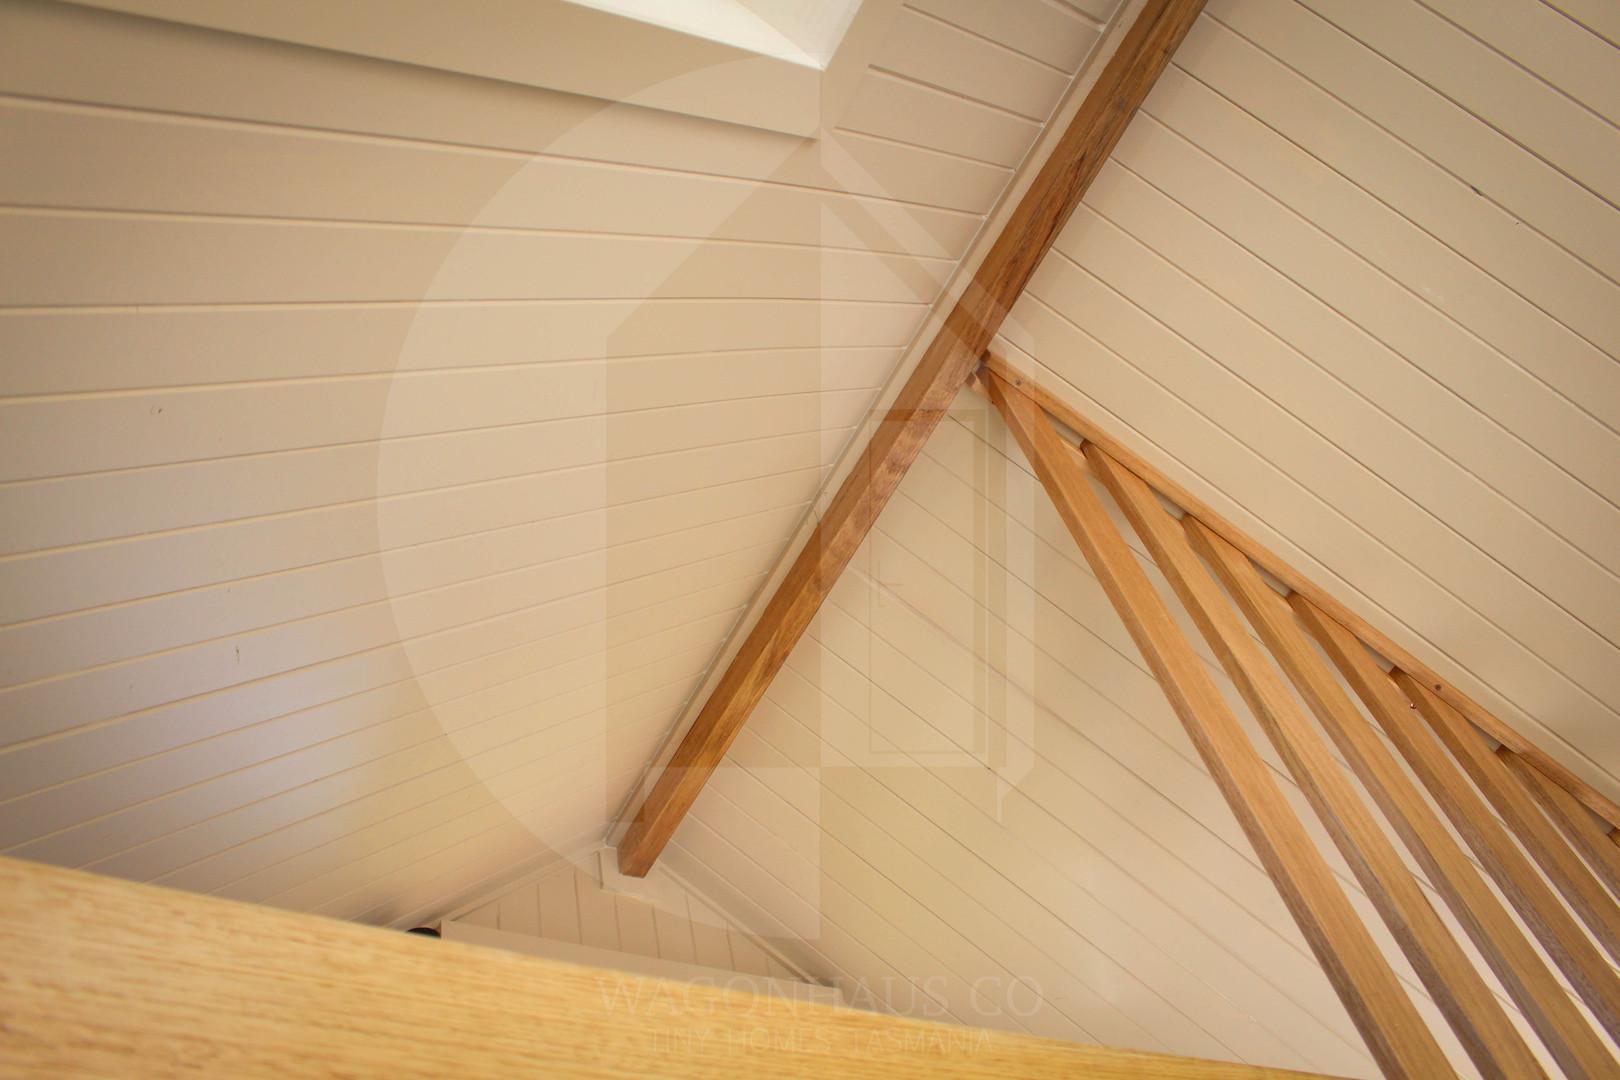 Wagonhaus Co P_L - Tiny Monument - Interior - Ceiling.jpg